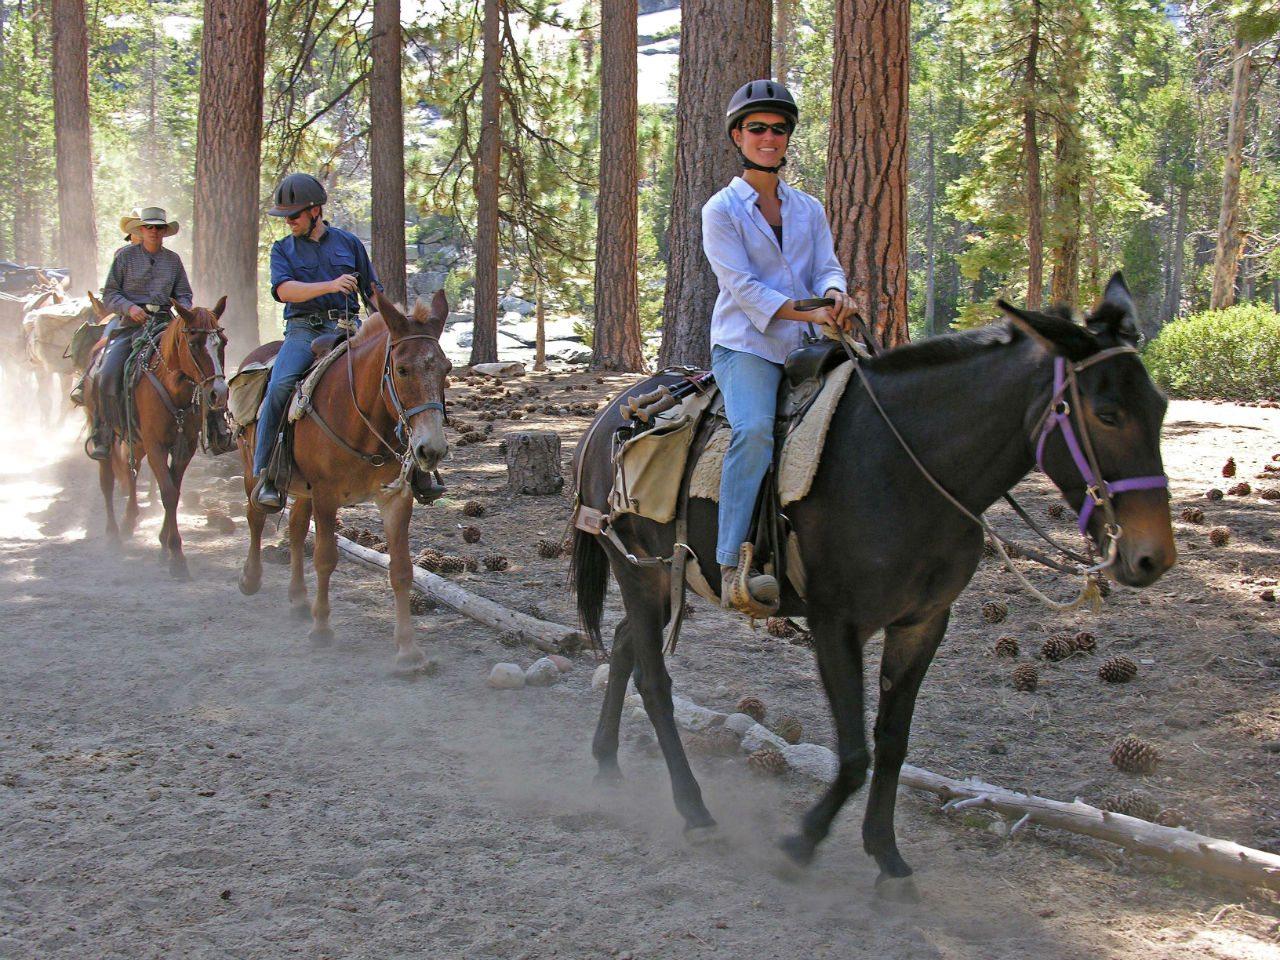 Paseo a caballo en el valle de Yosemite